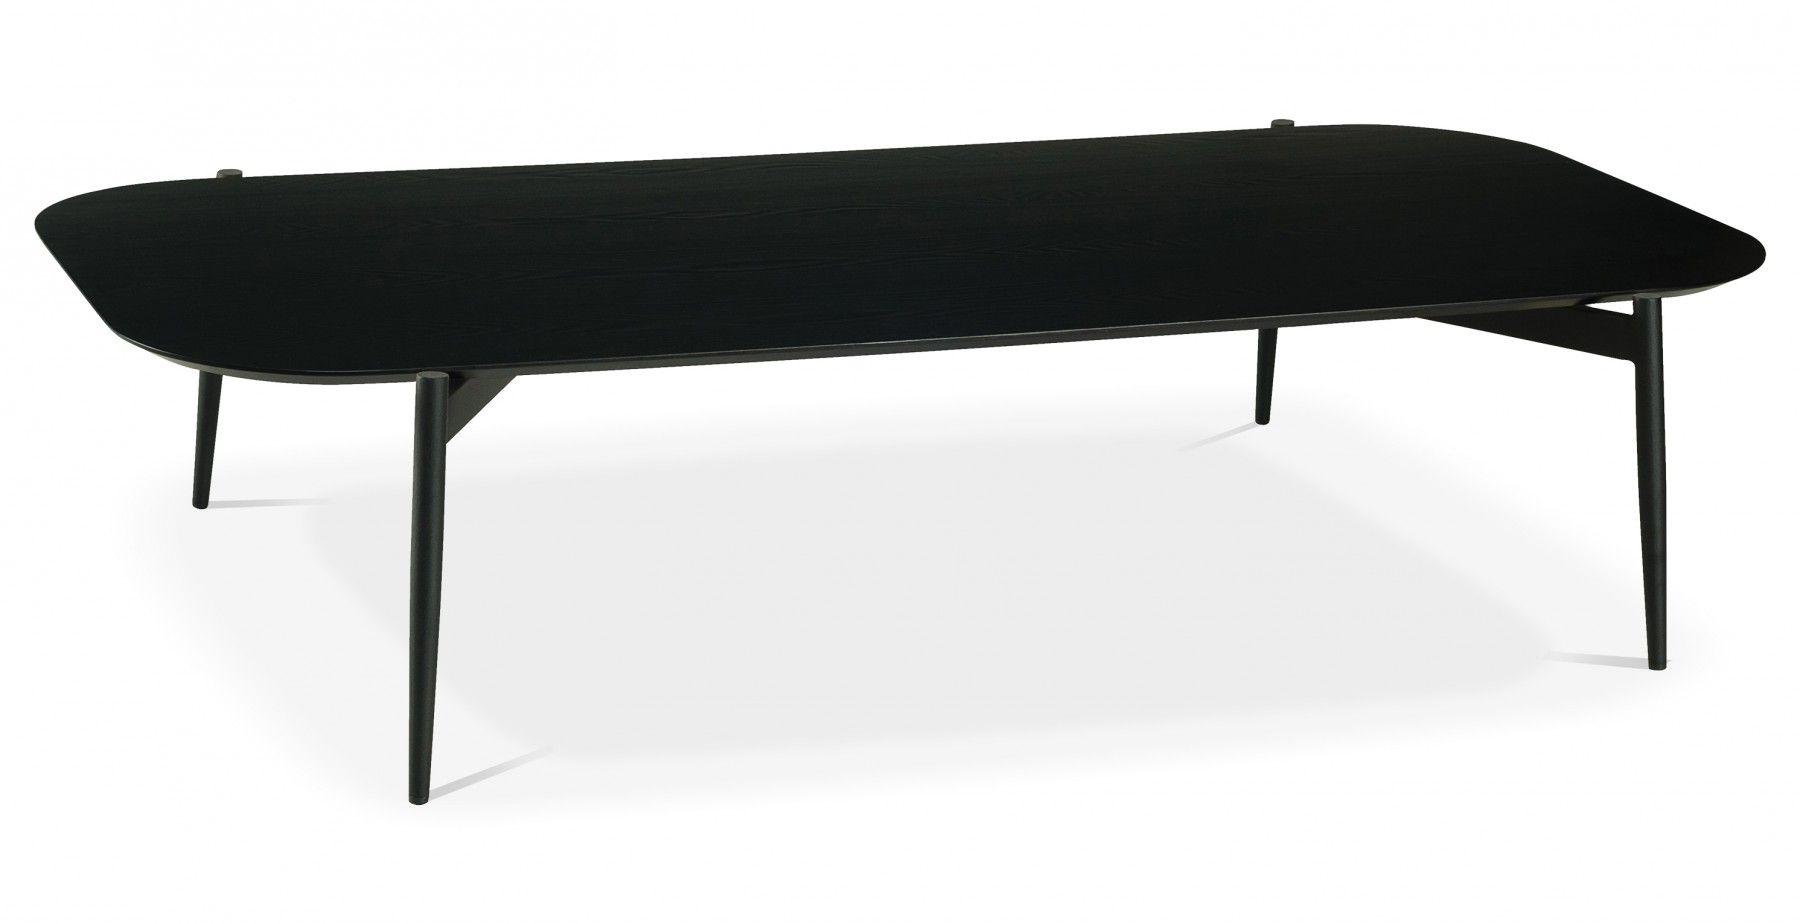 Alec Low Coffee Table, Black Fern & Grey #black #low #coffeetable #FernandGrey